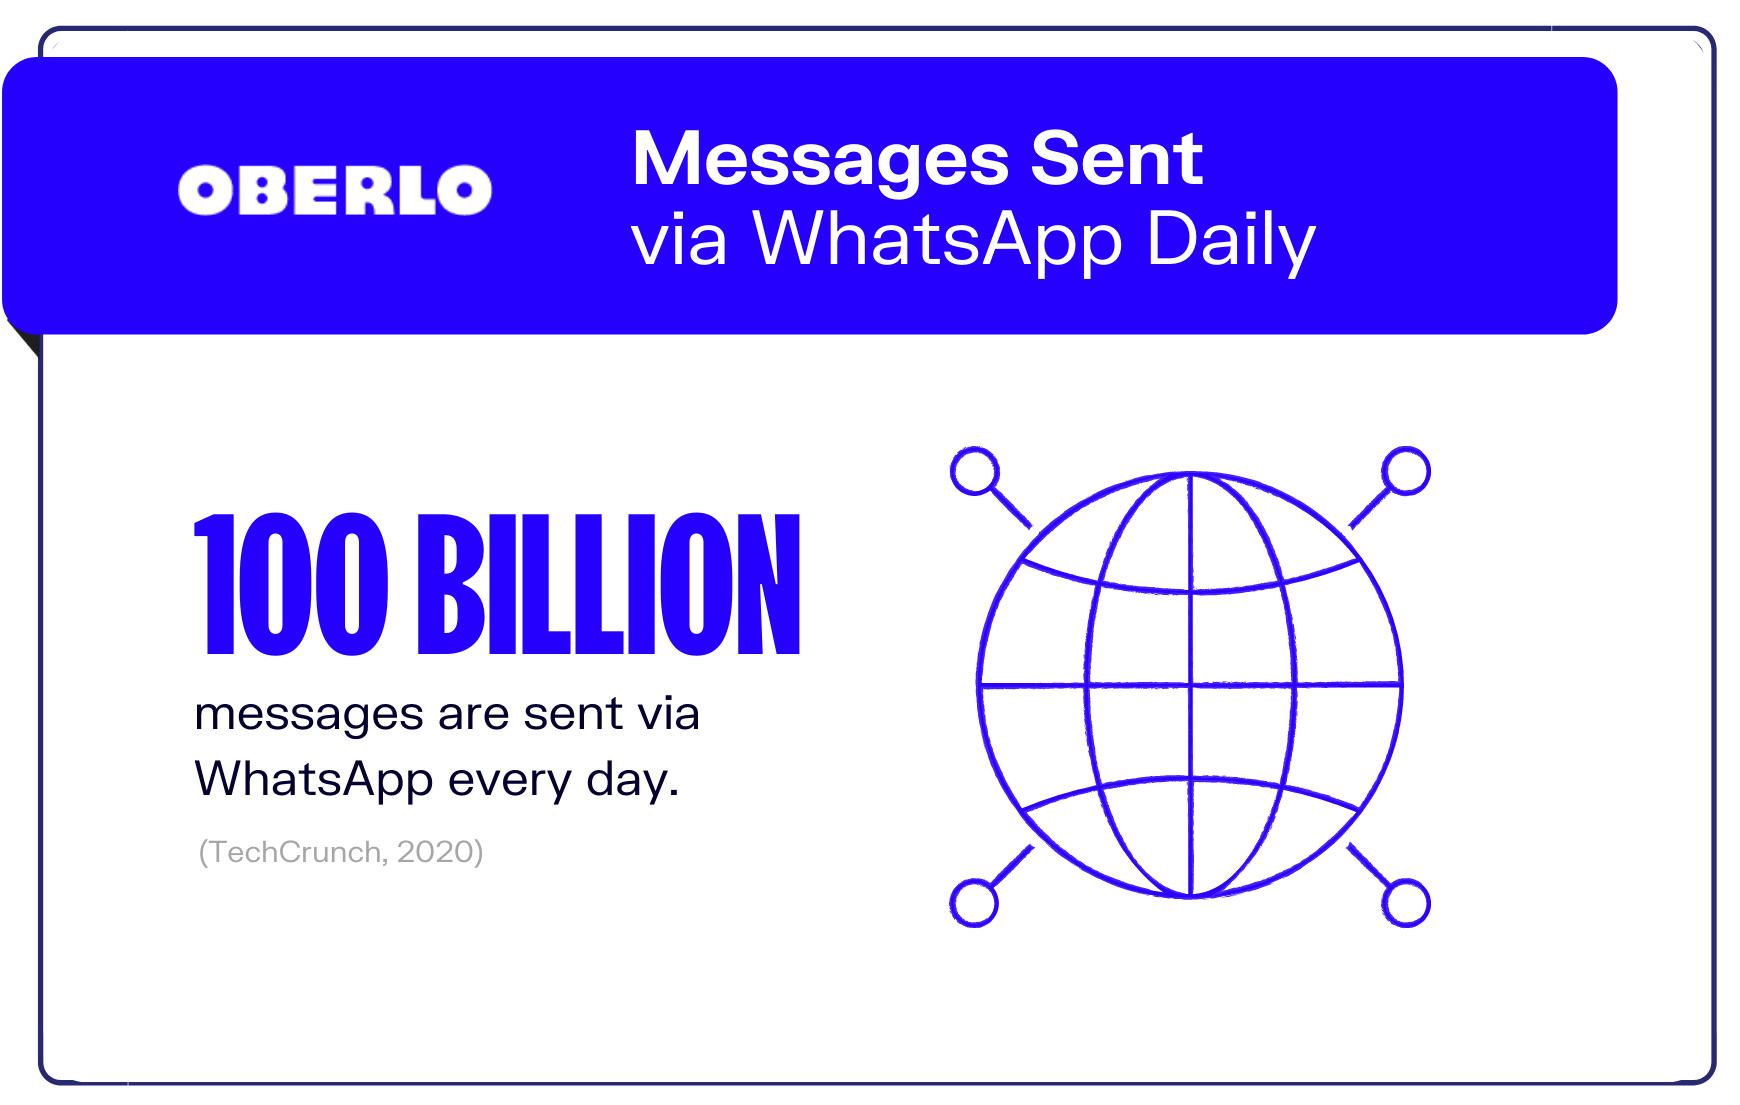 graphic of whatsapp statistic #6